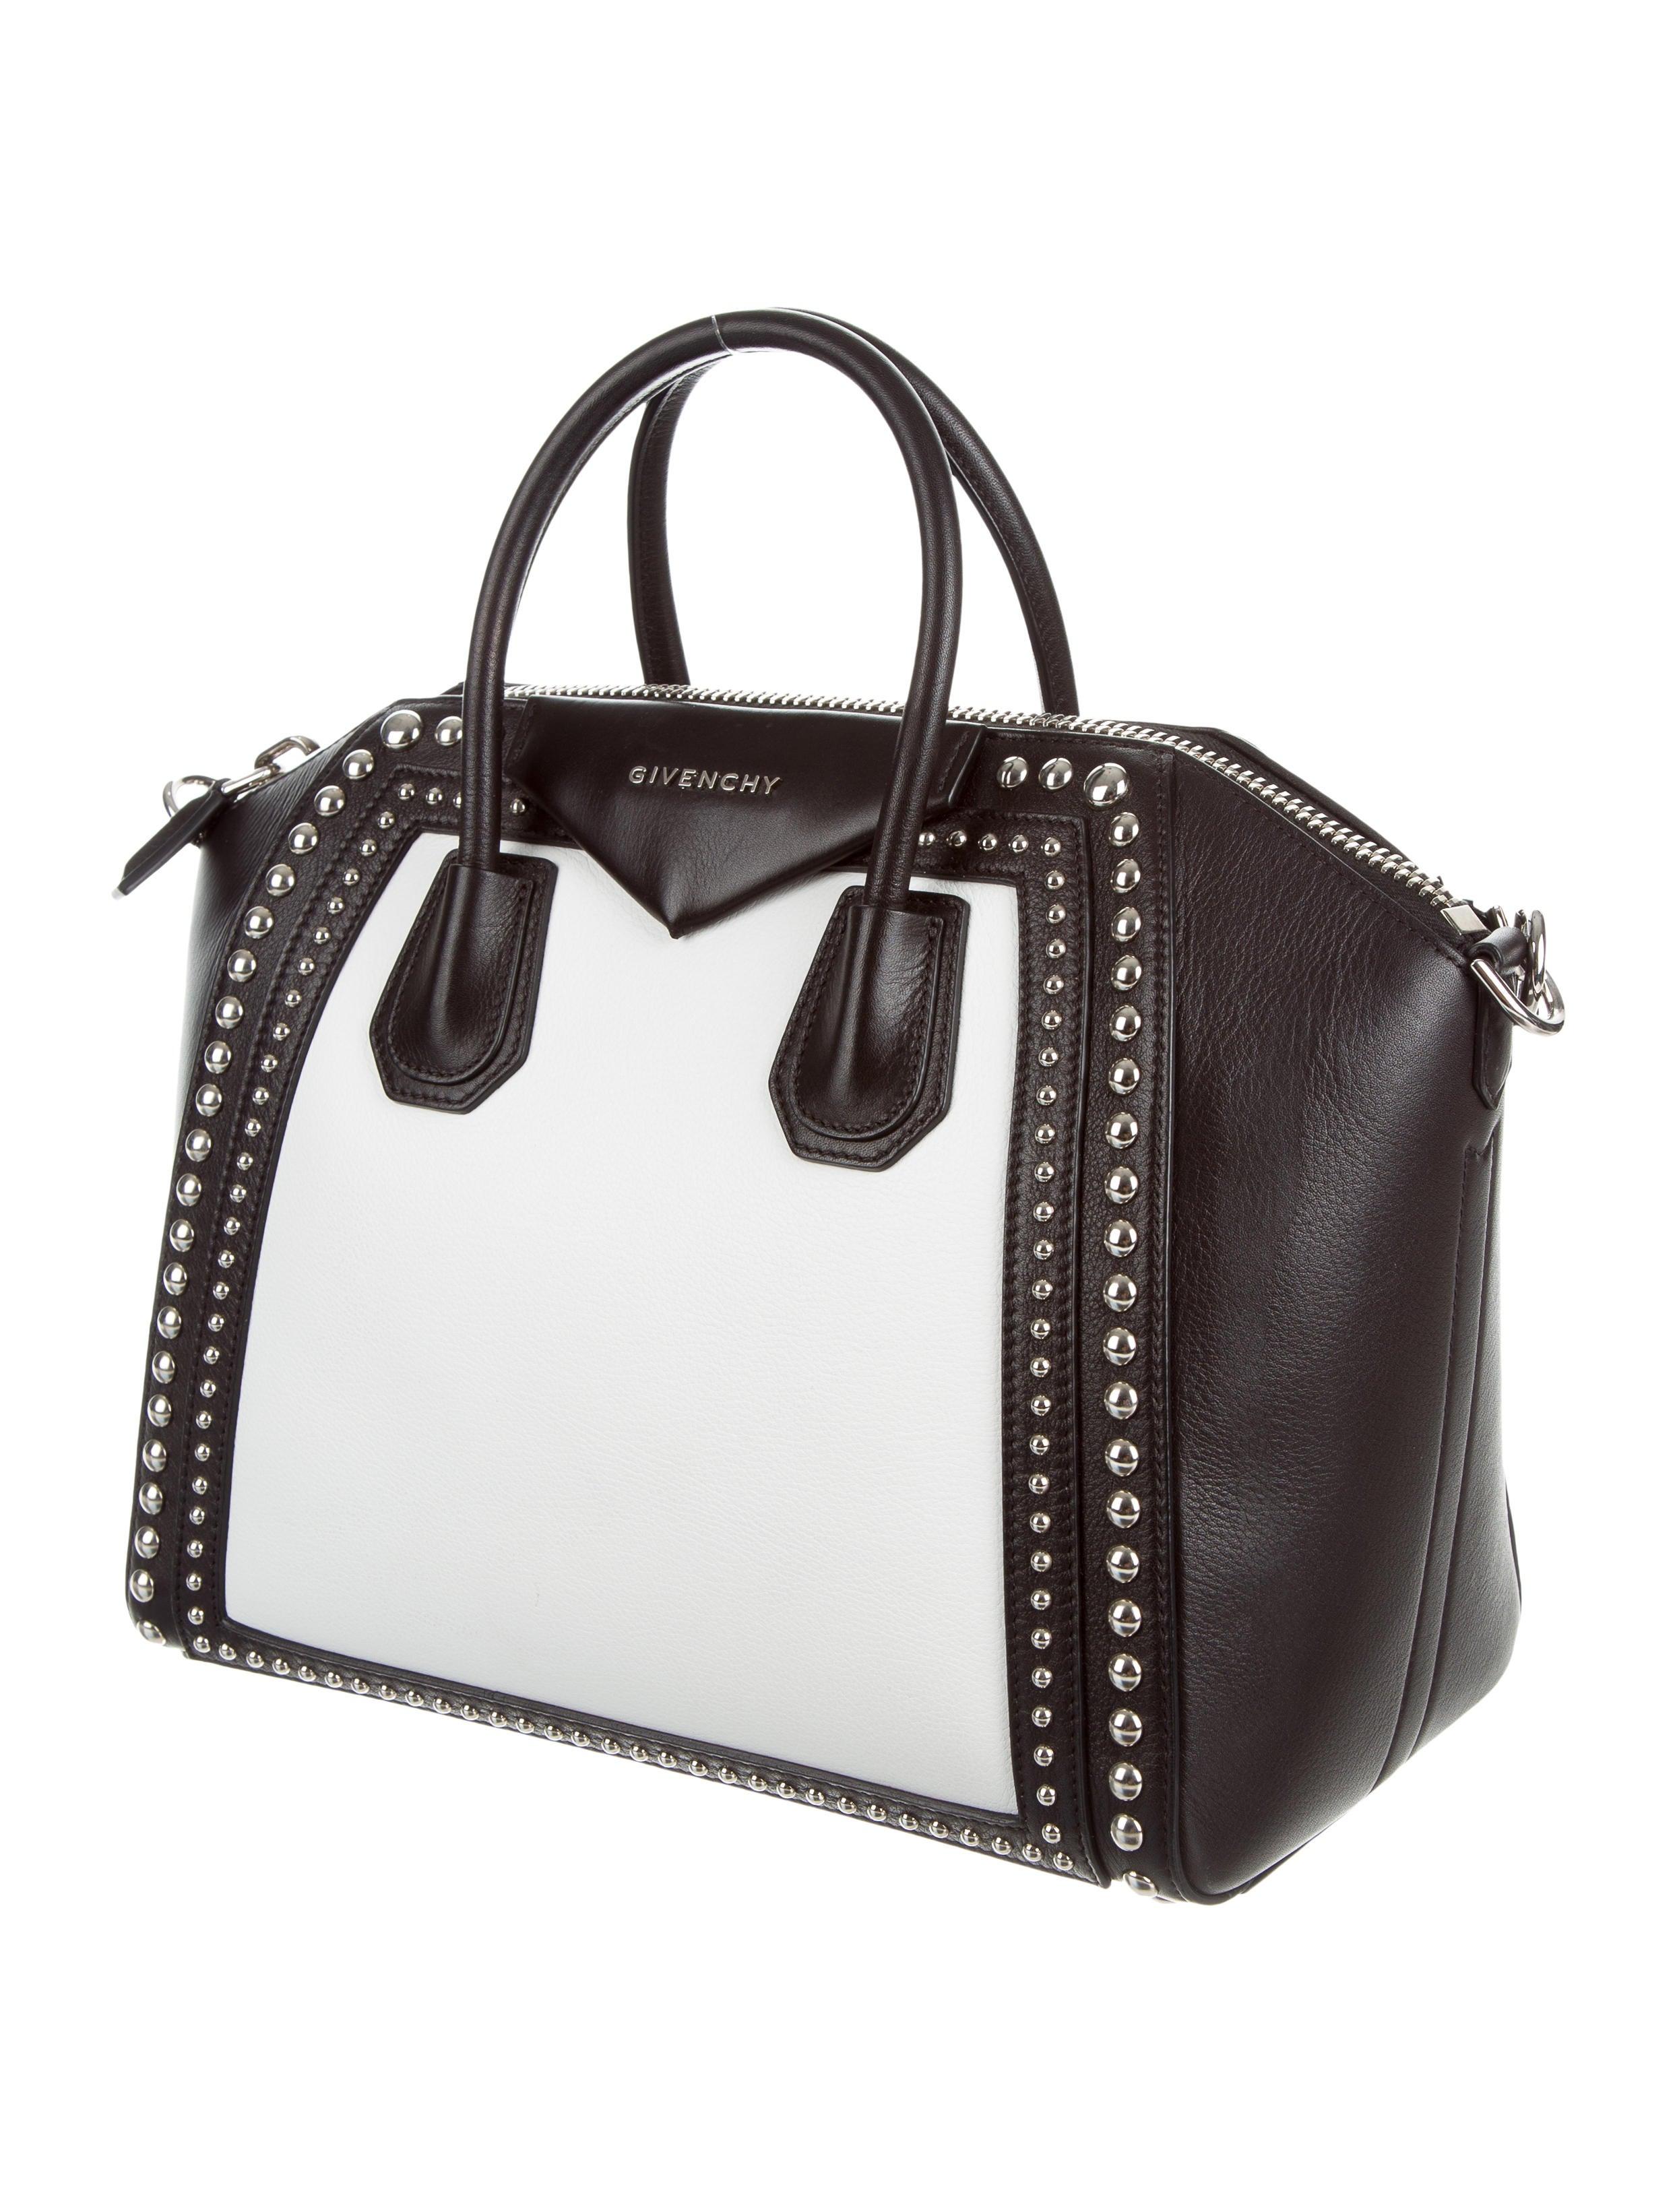 How Much Is Givenchy Antigona Bag